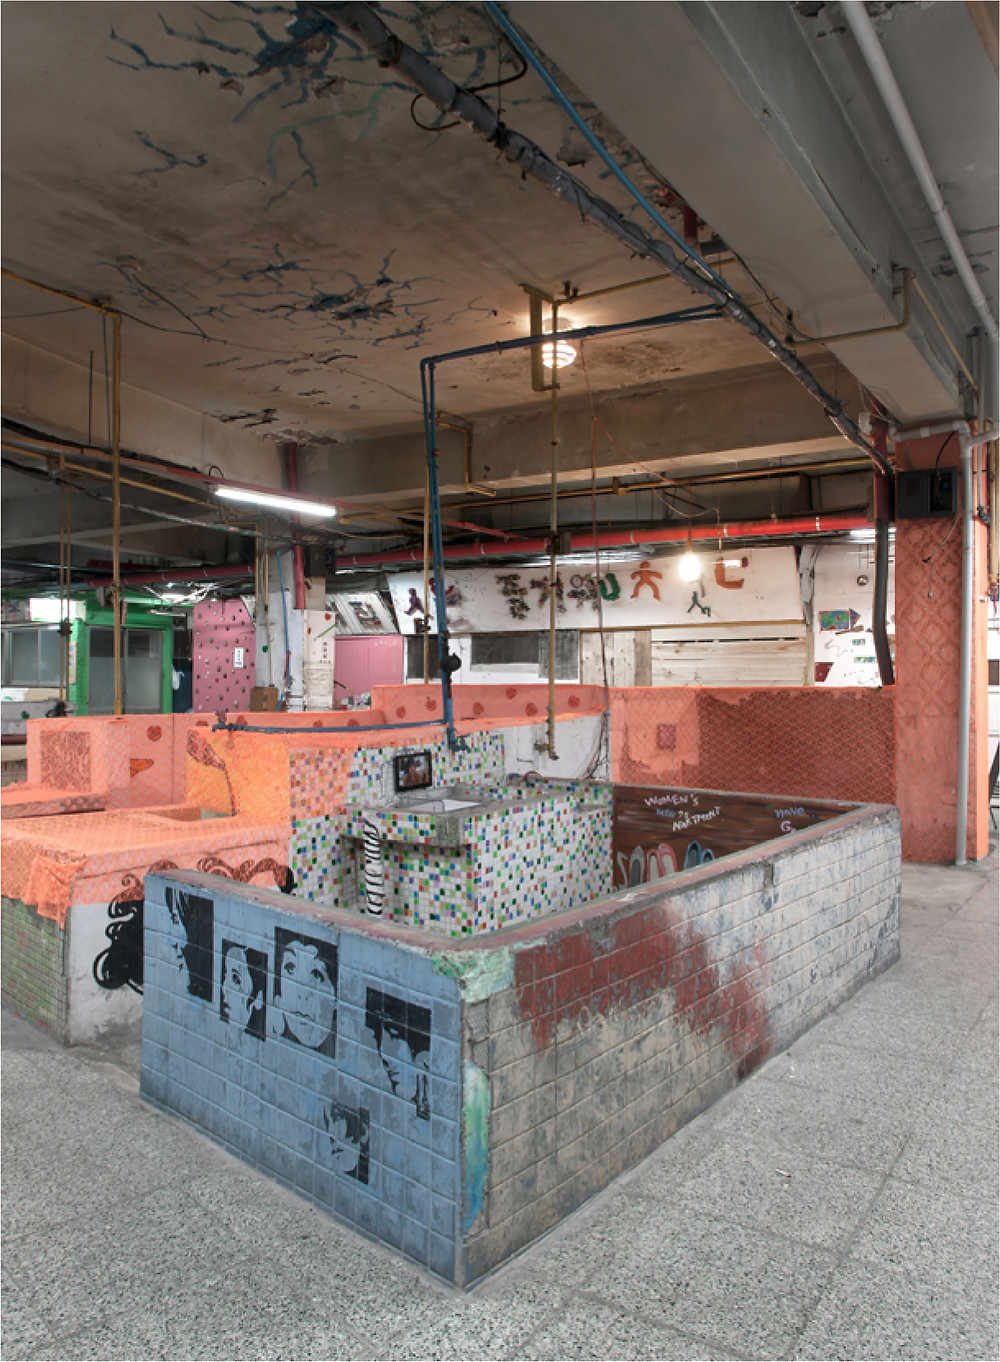 Installation's view